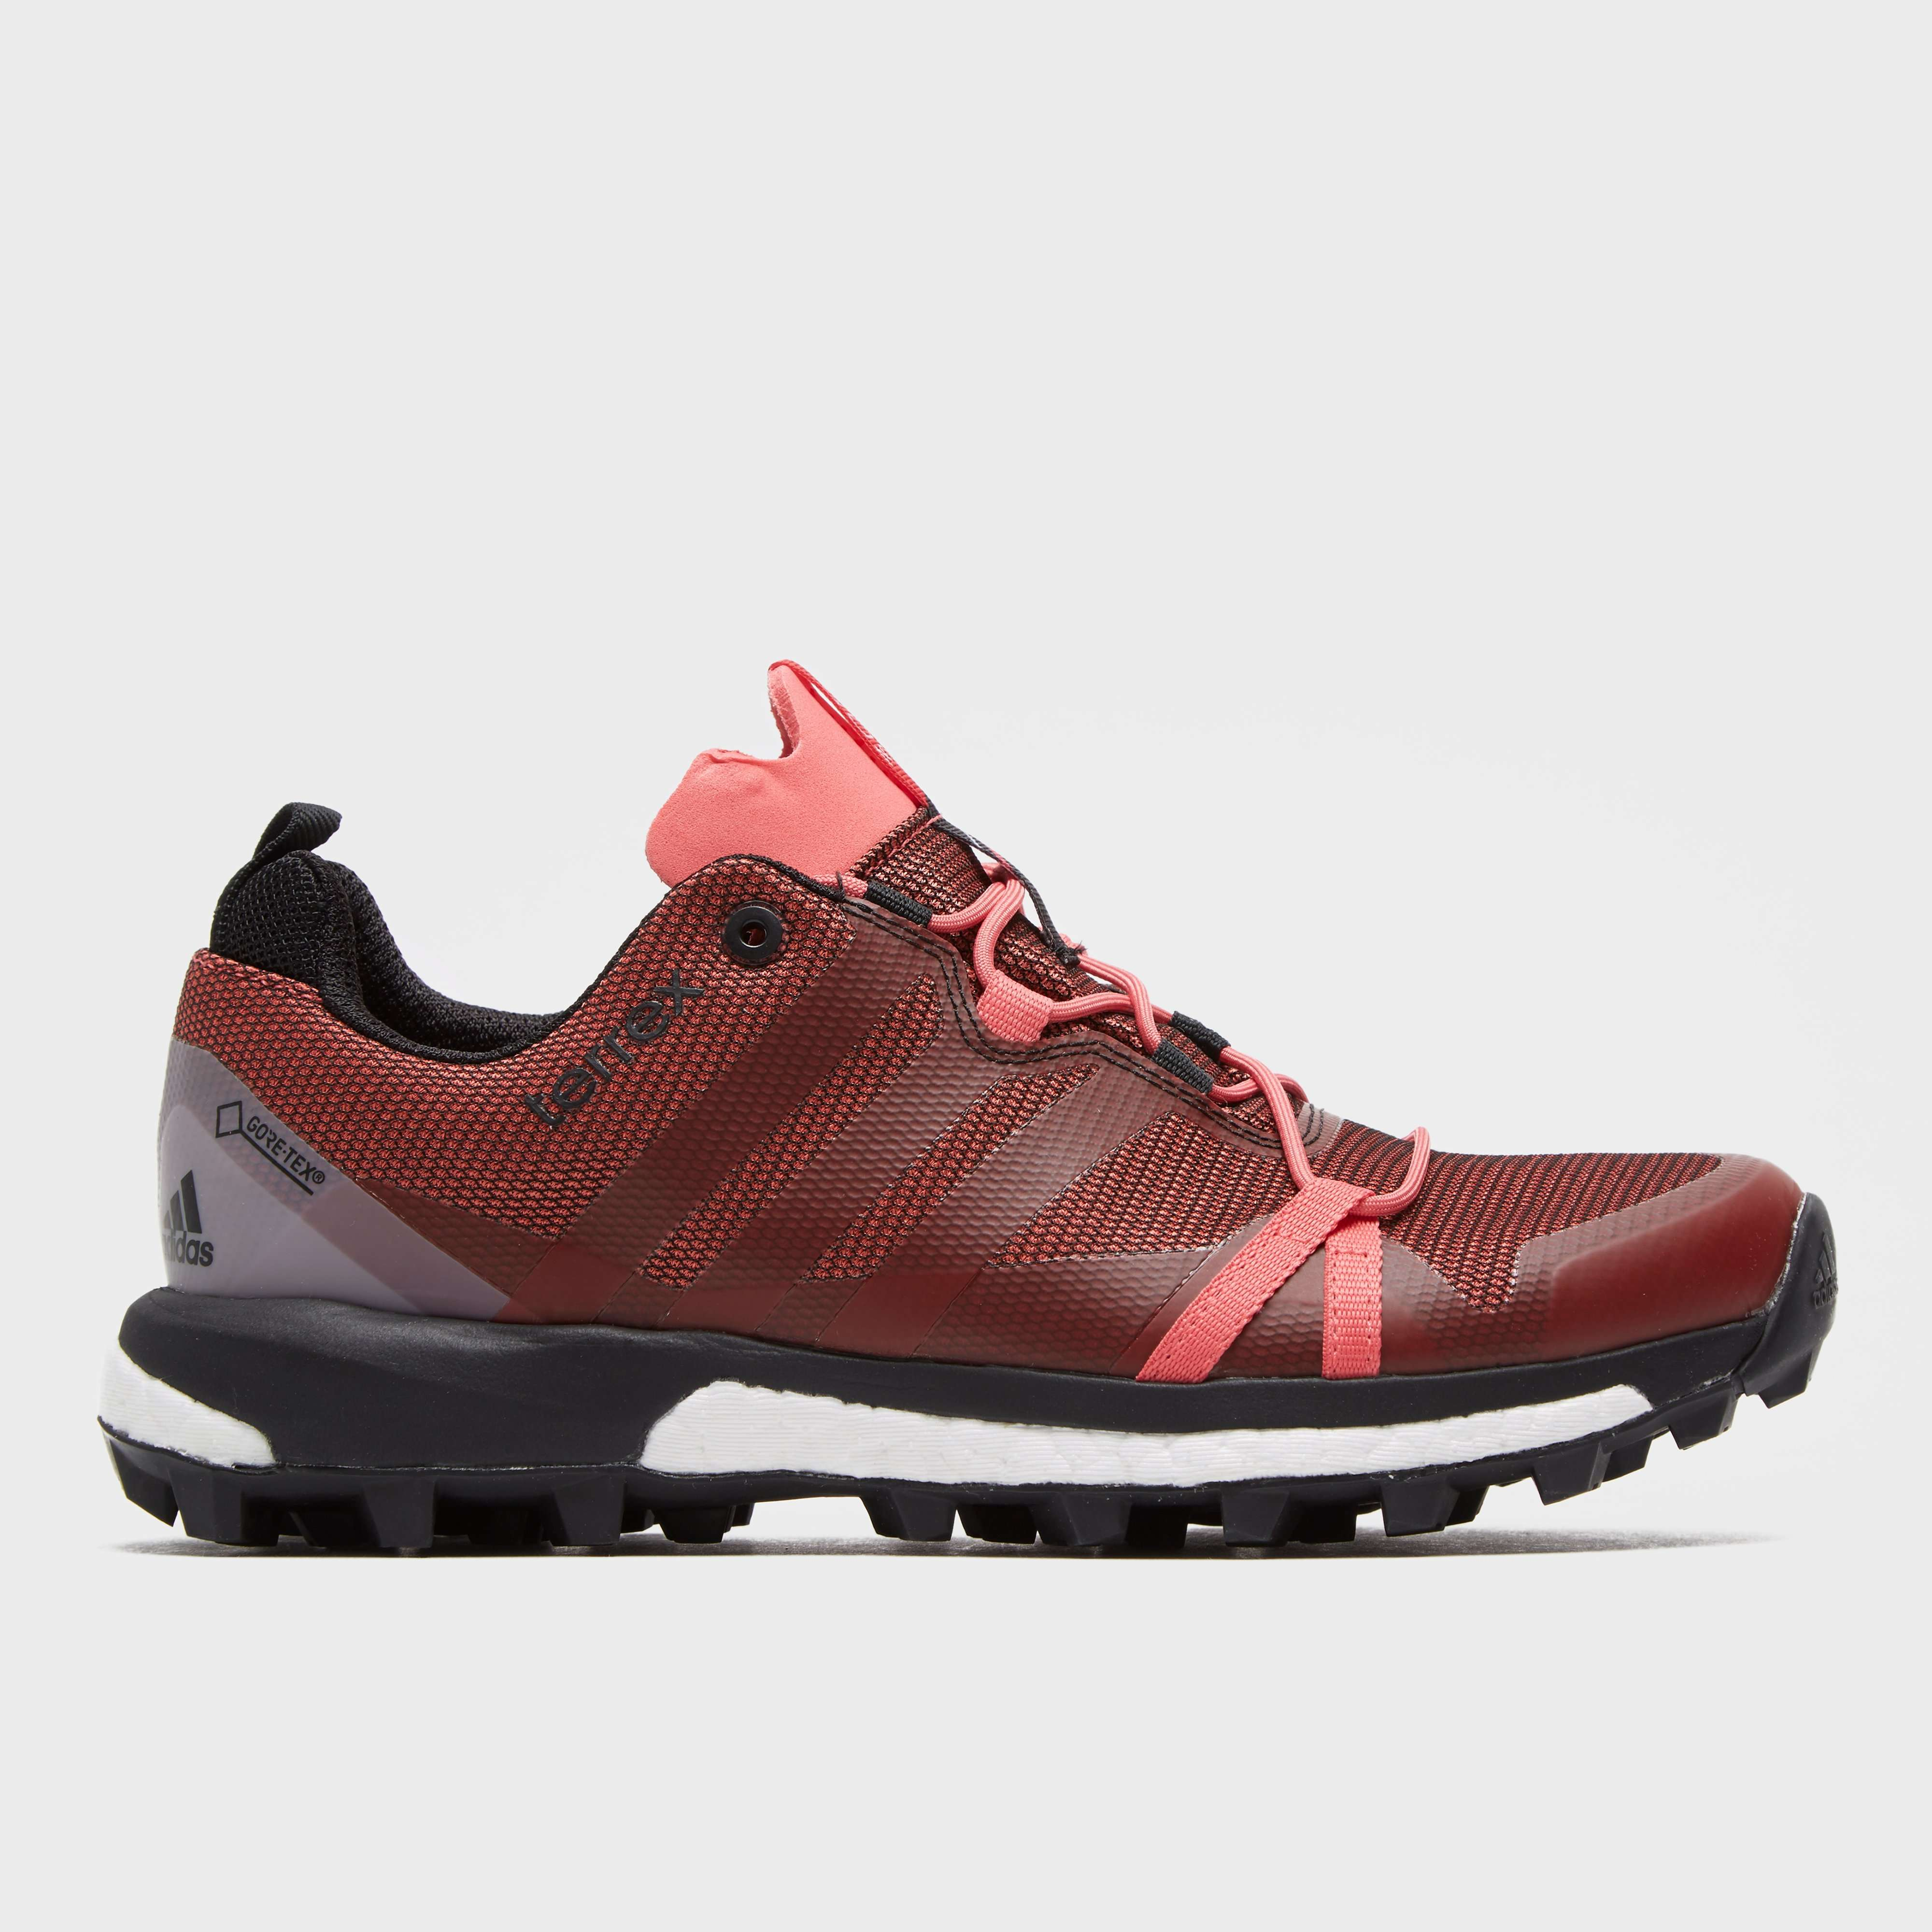 ADIDAS Women's Terrex Agravic Boost™ GORE-TEX® Shoe